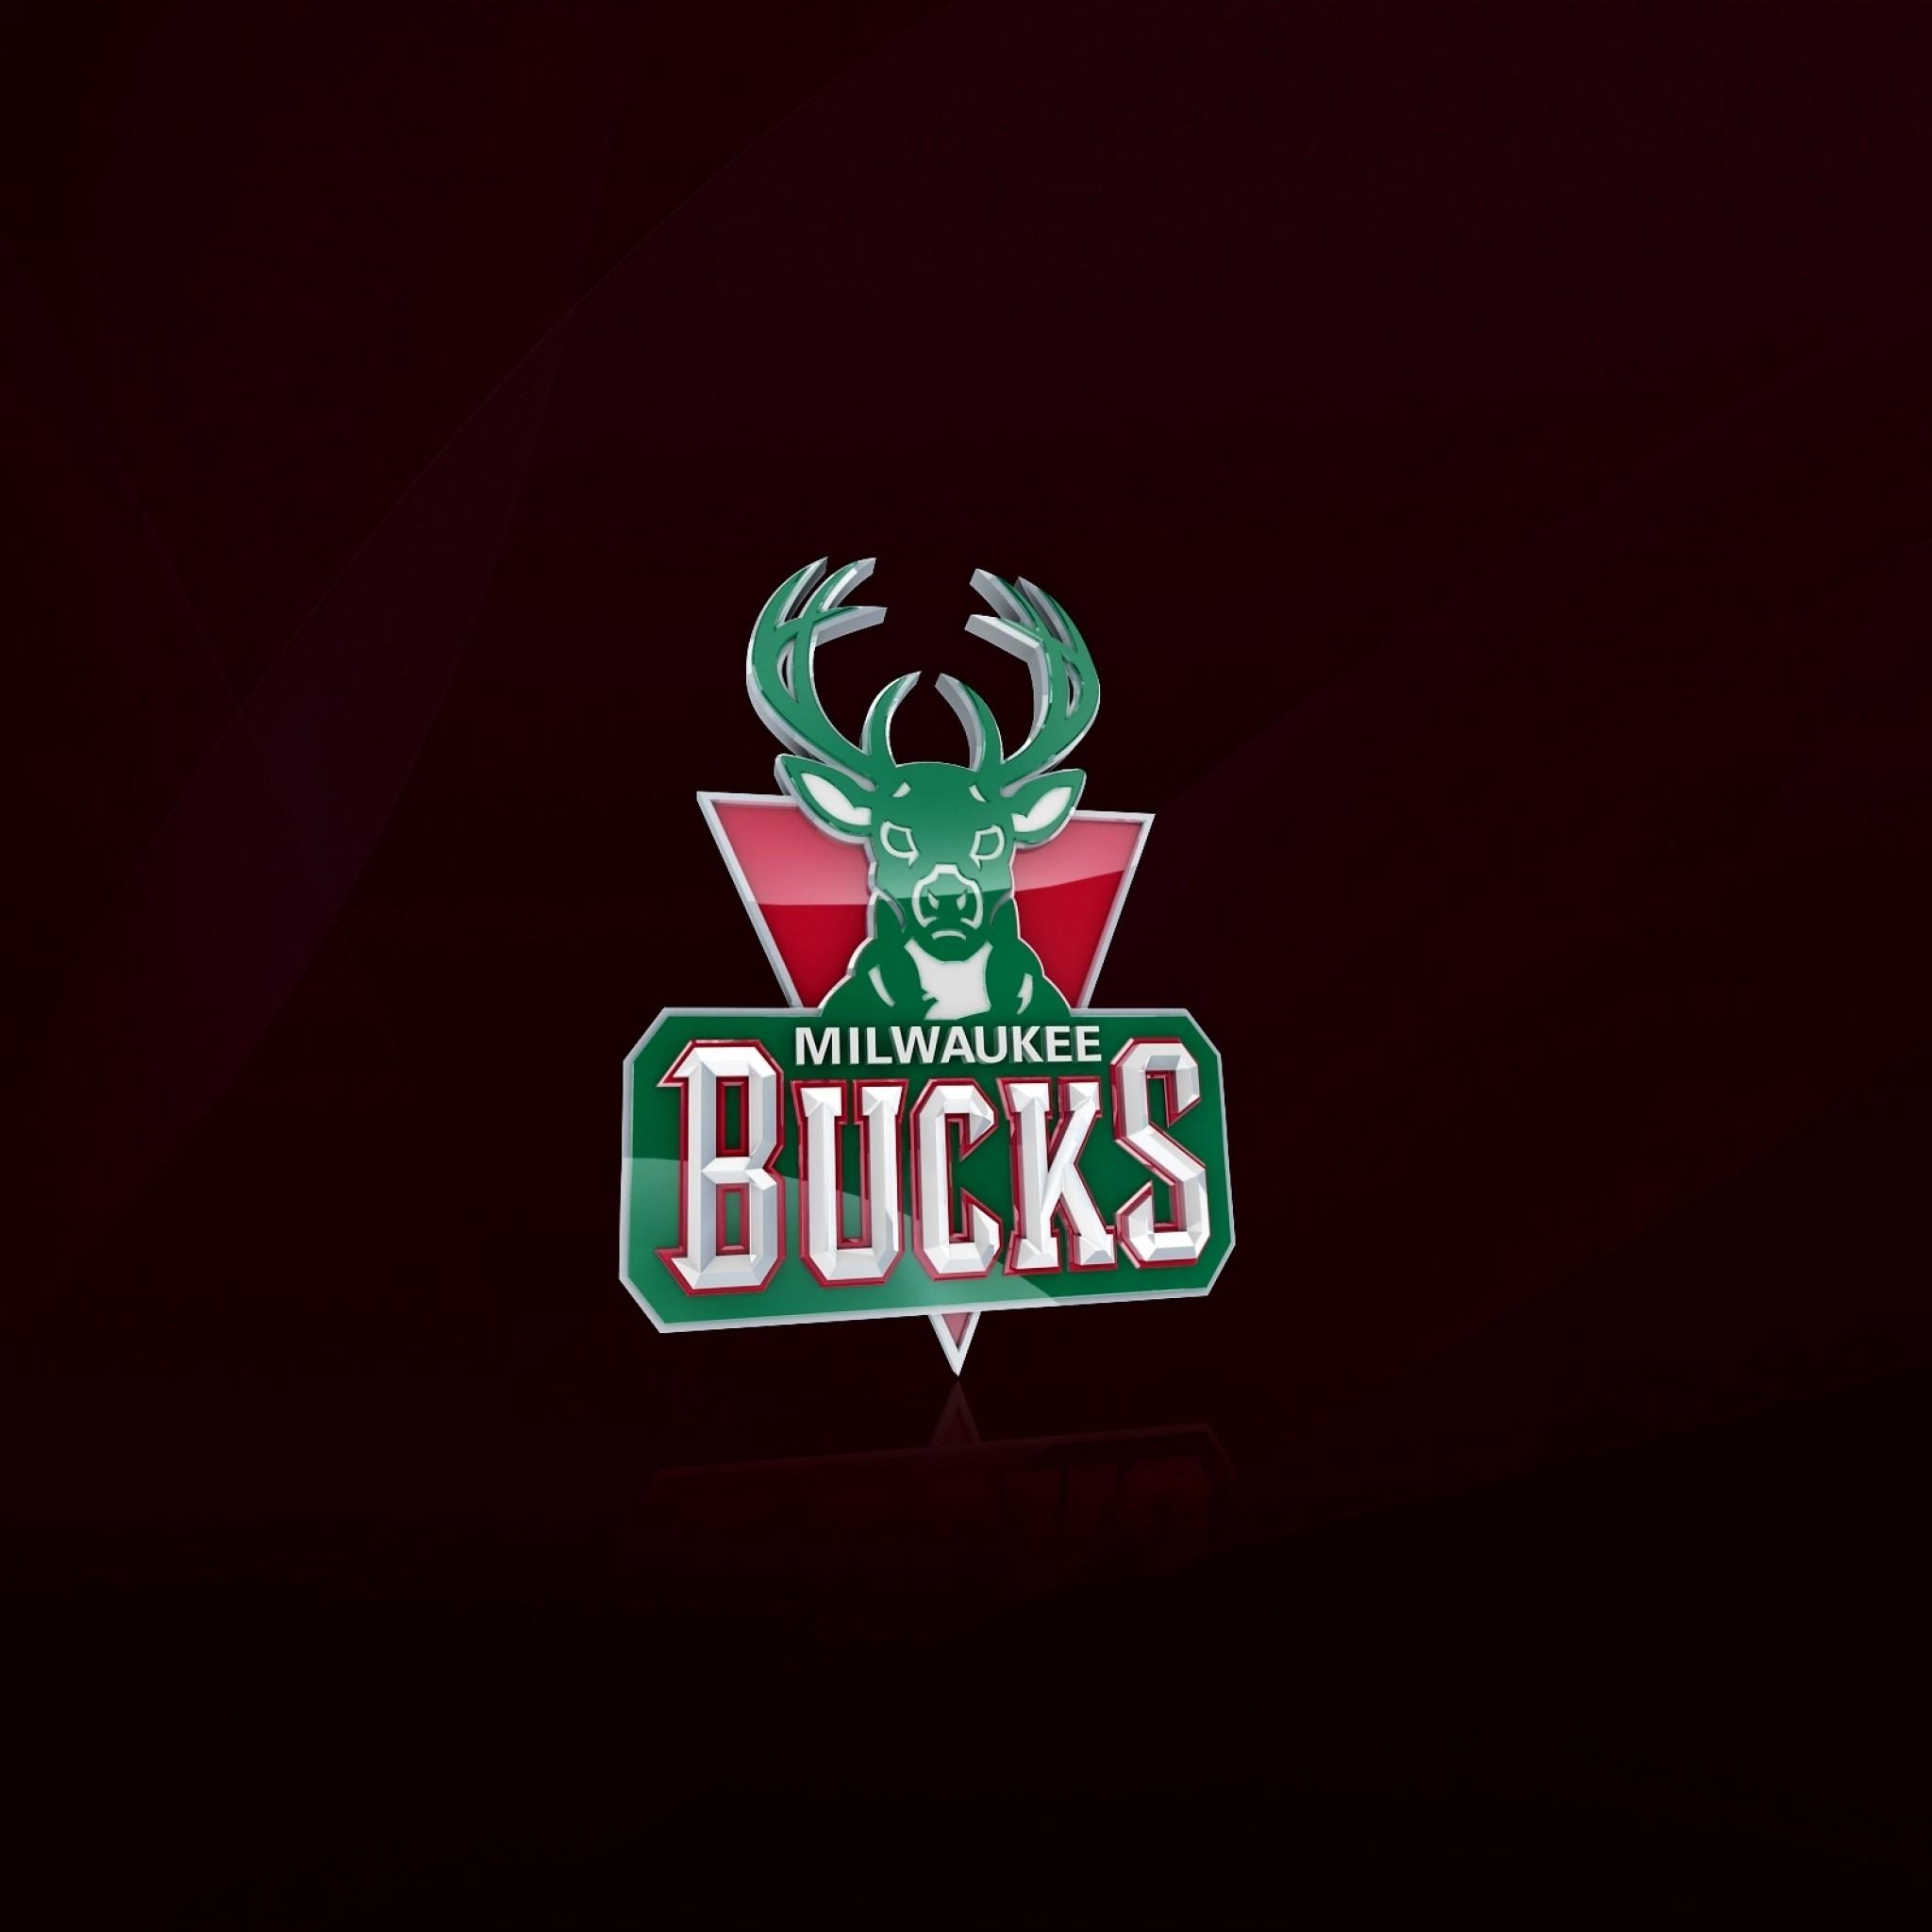 2048x2048 Preview Wallpaper Milwaukee Bucks Nba Basketball Logo Download Brooklyn